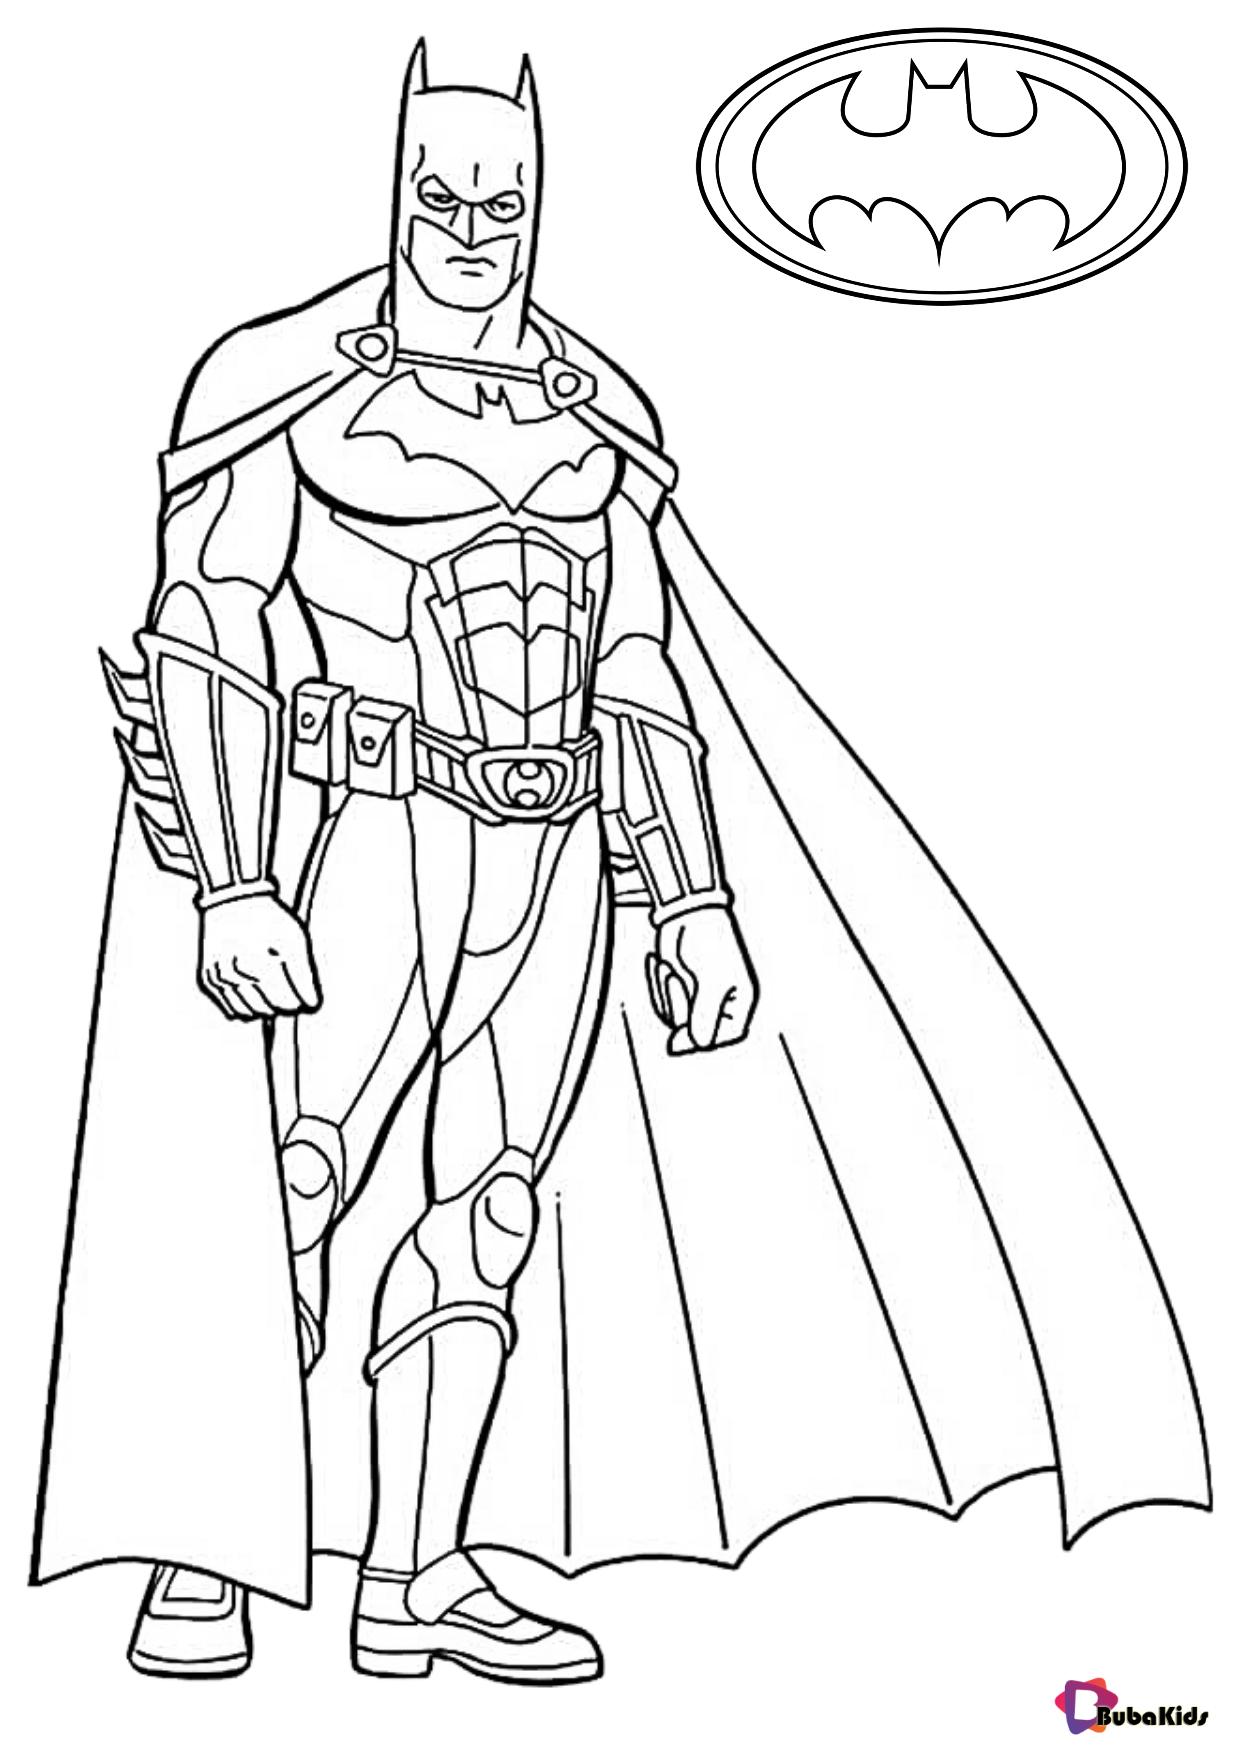 Nice Superhero Color Pages Marvel Super Hero Drawings Coloring Superhero Coloring Pages Superhero Coloring Drawing Superheroes